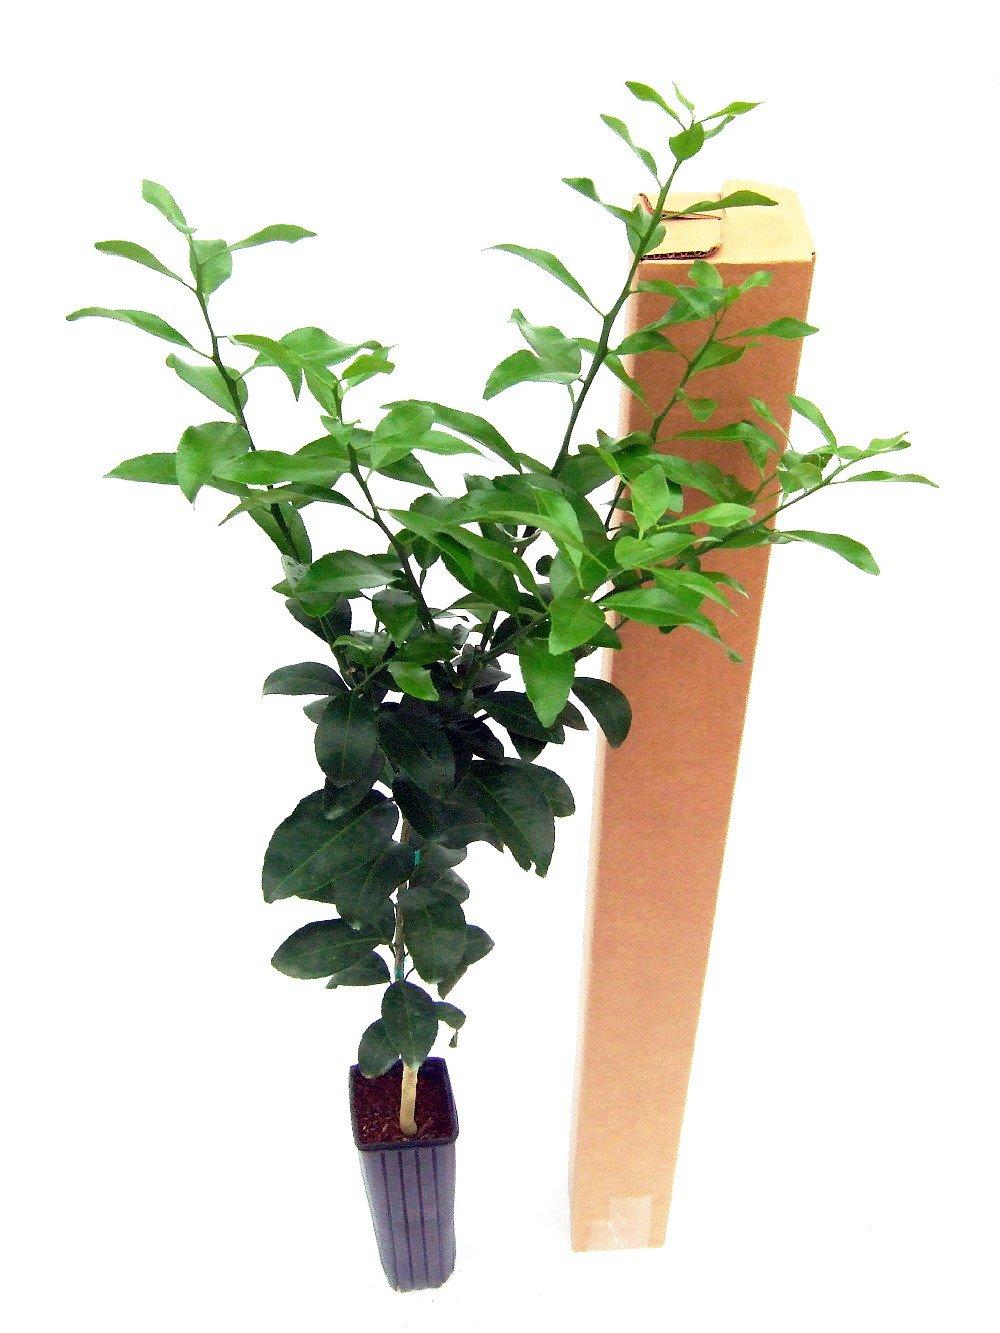 Kaffir Lime Tree-Fruit Bearing Size-Indoors/Out-NO Ship TX,FL,AZ,CA,LA,HI-5'' Pot by Hirt's Gardens (Image #5)